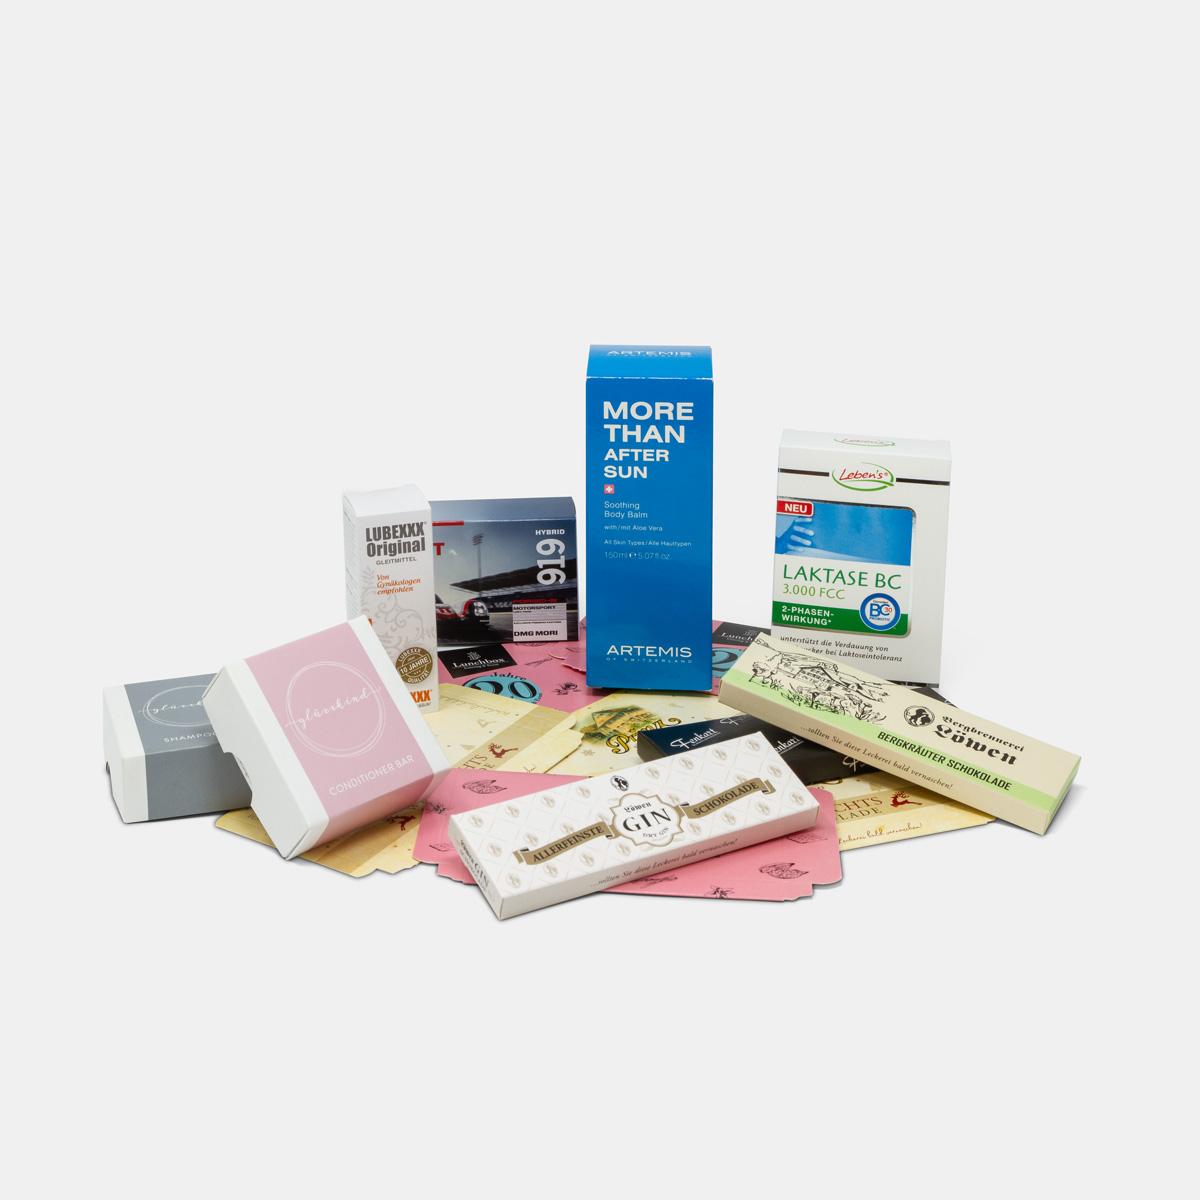 PackSolutions KG - Packaging